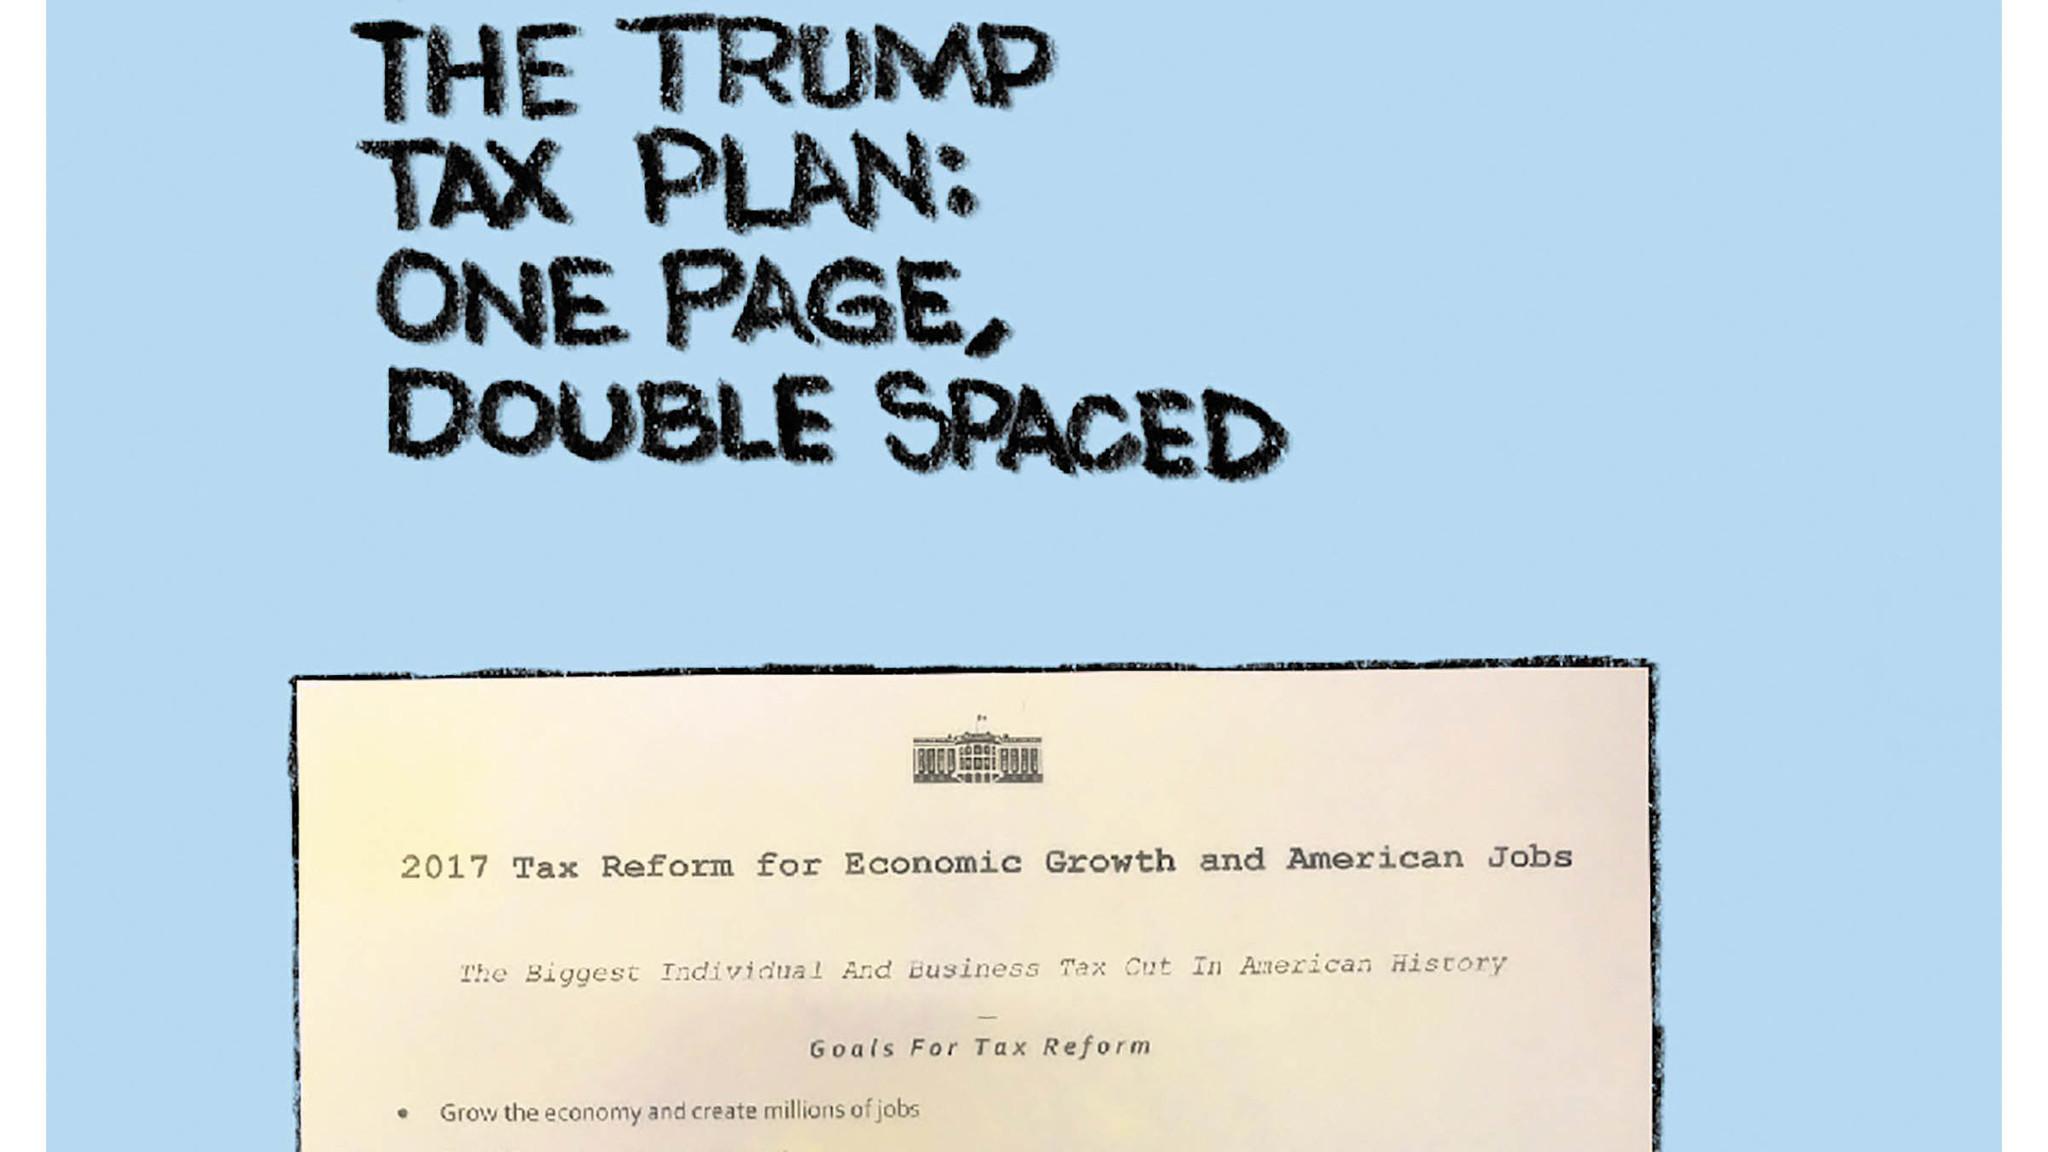 The Trump Tax Plan Chicago Tribune